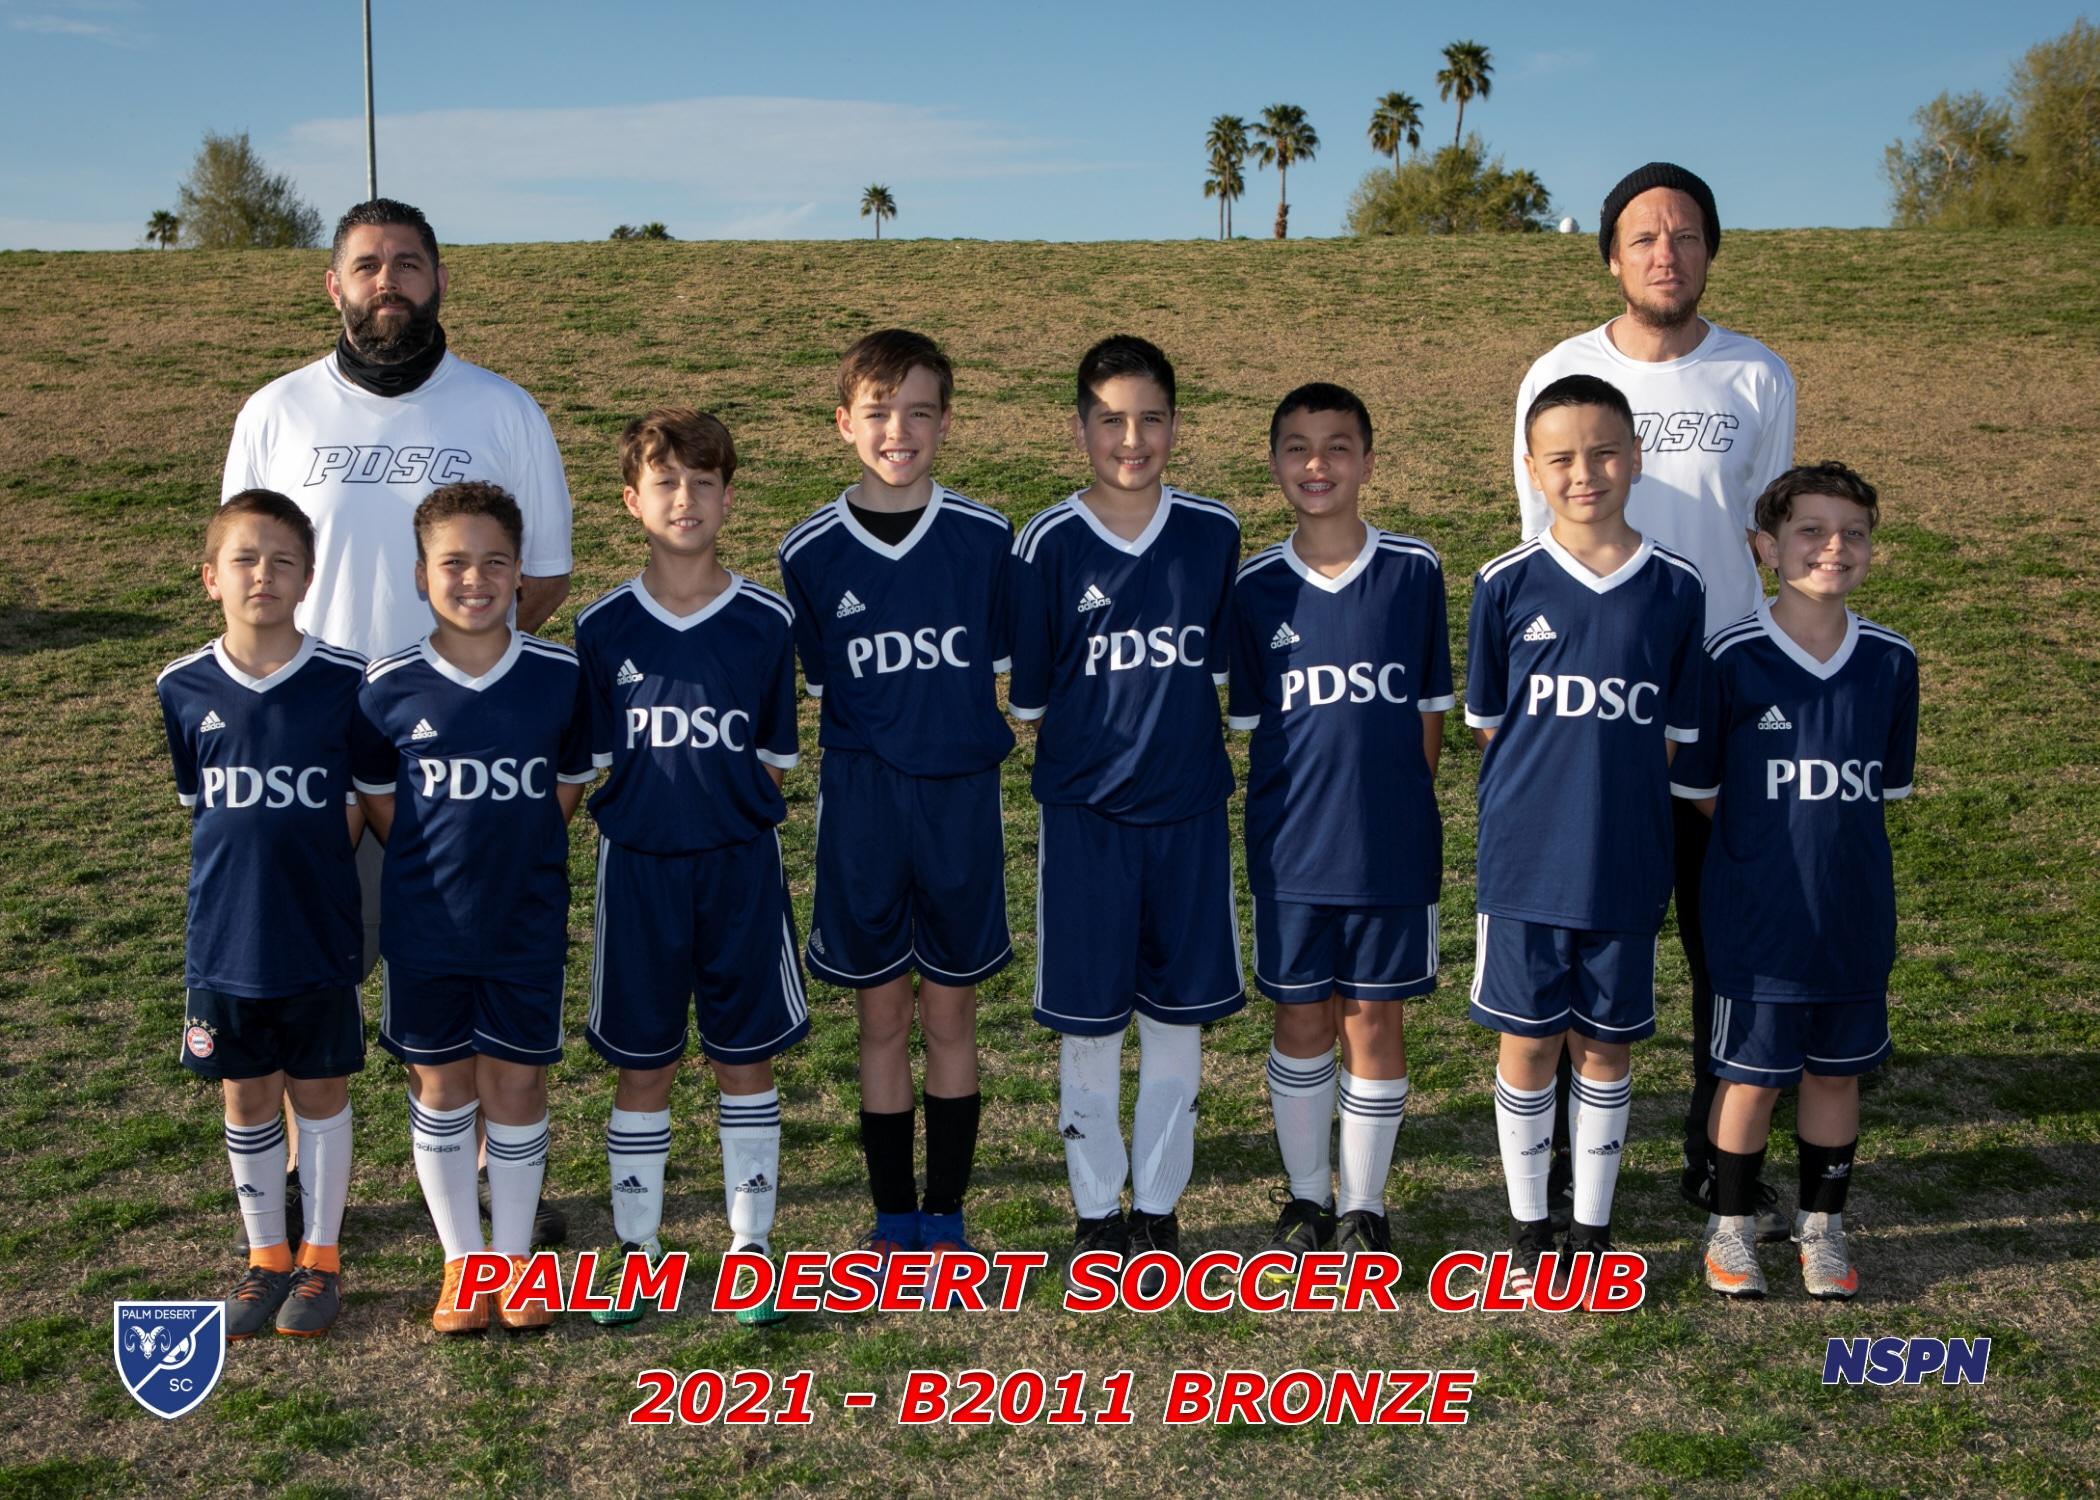 Palm Desert Soccer Club B2011 Bronze